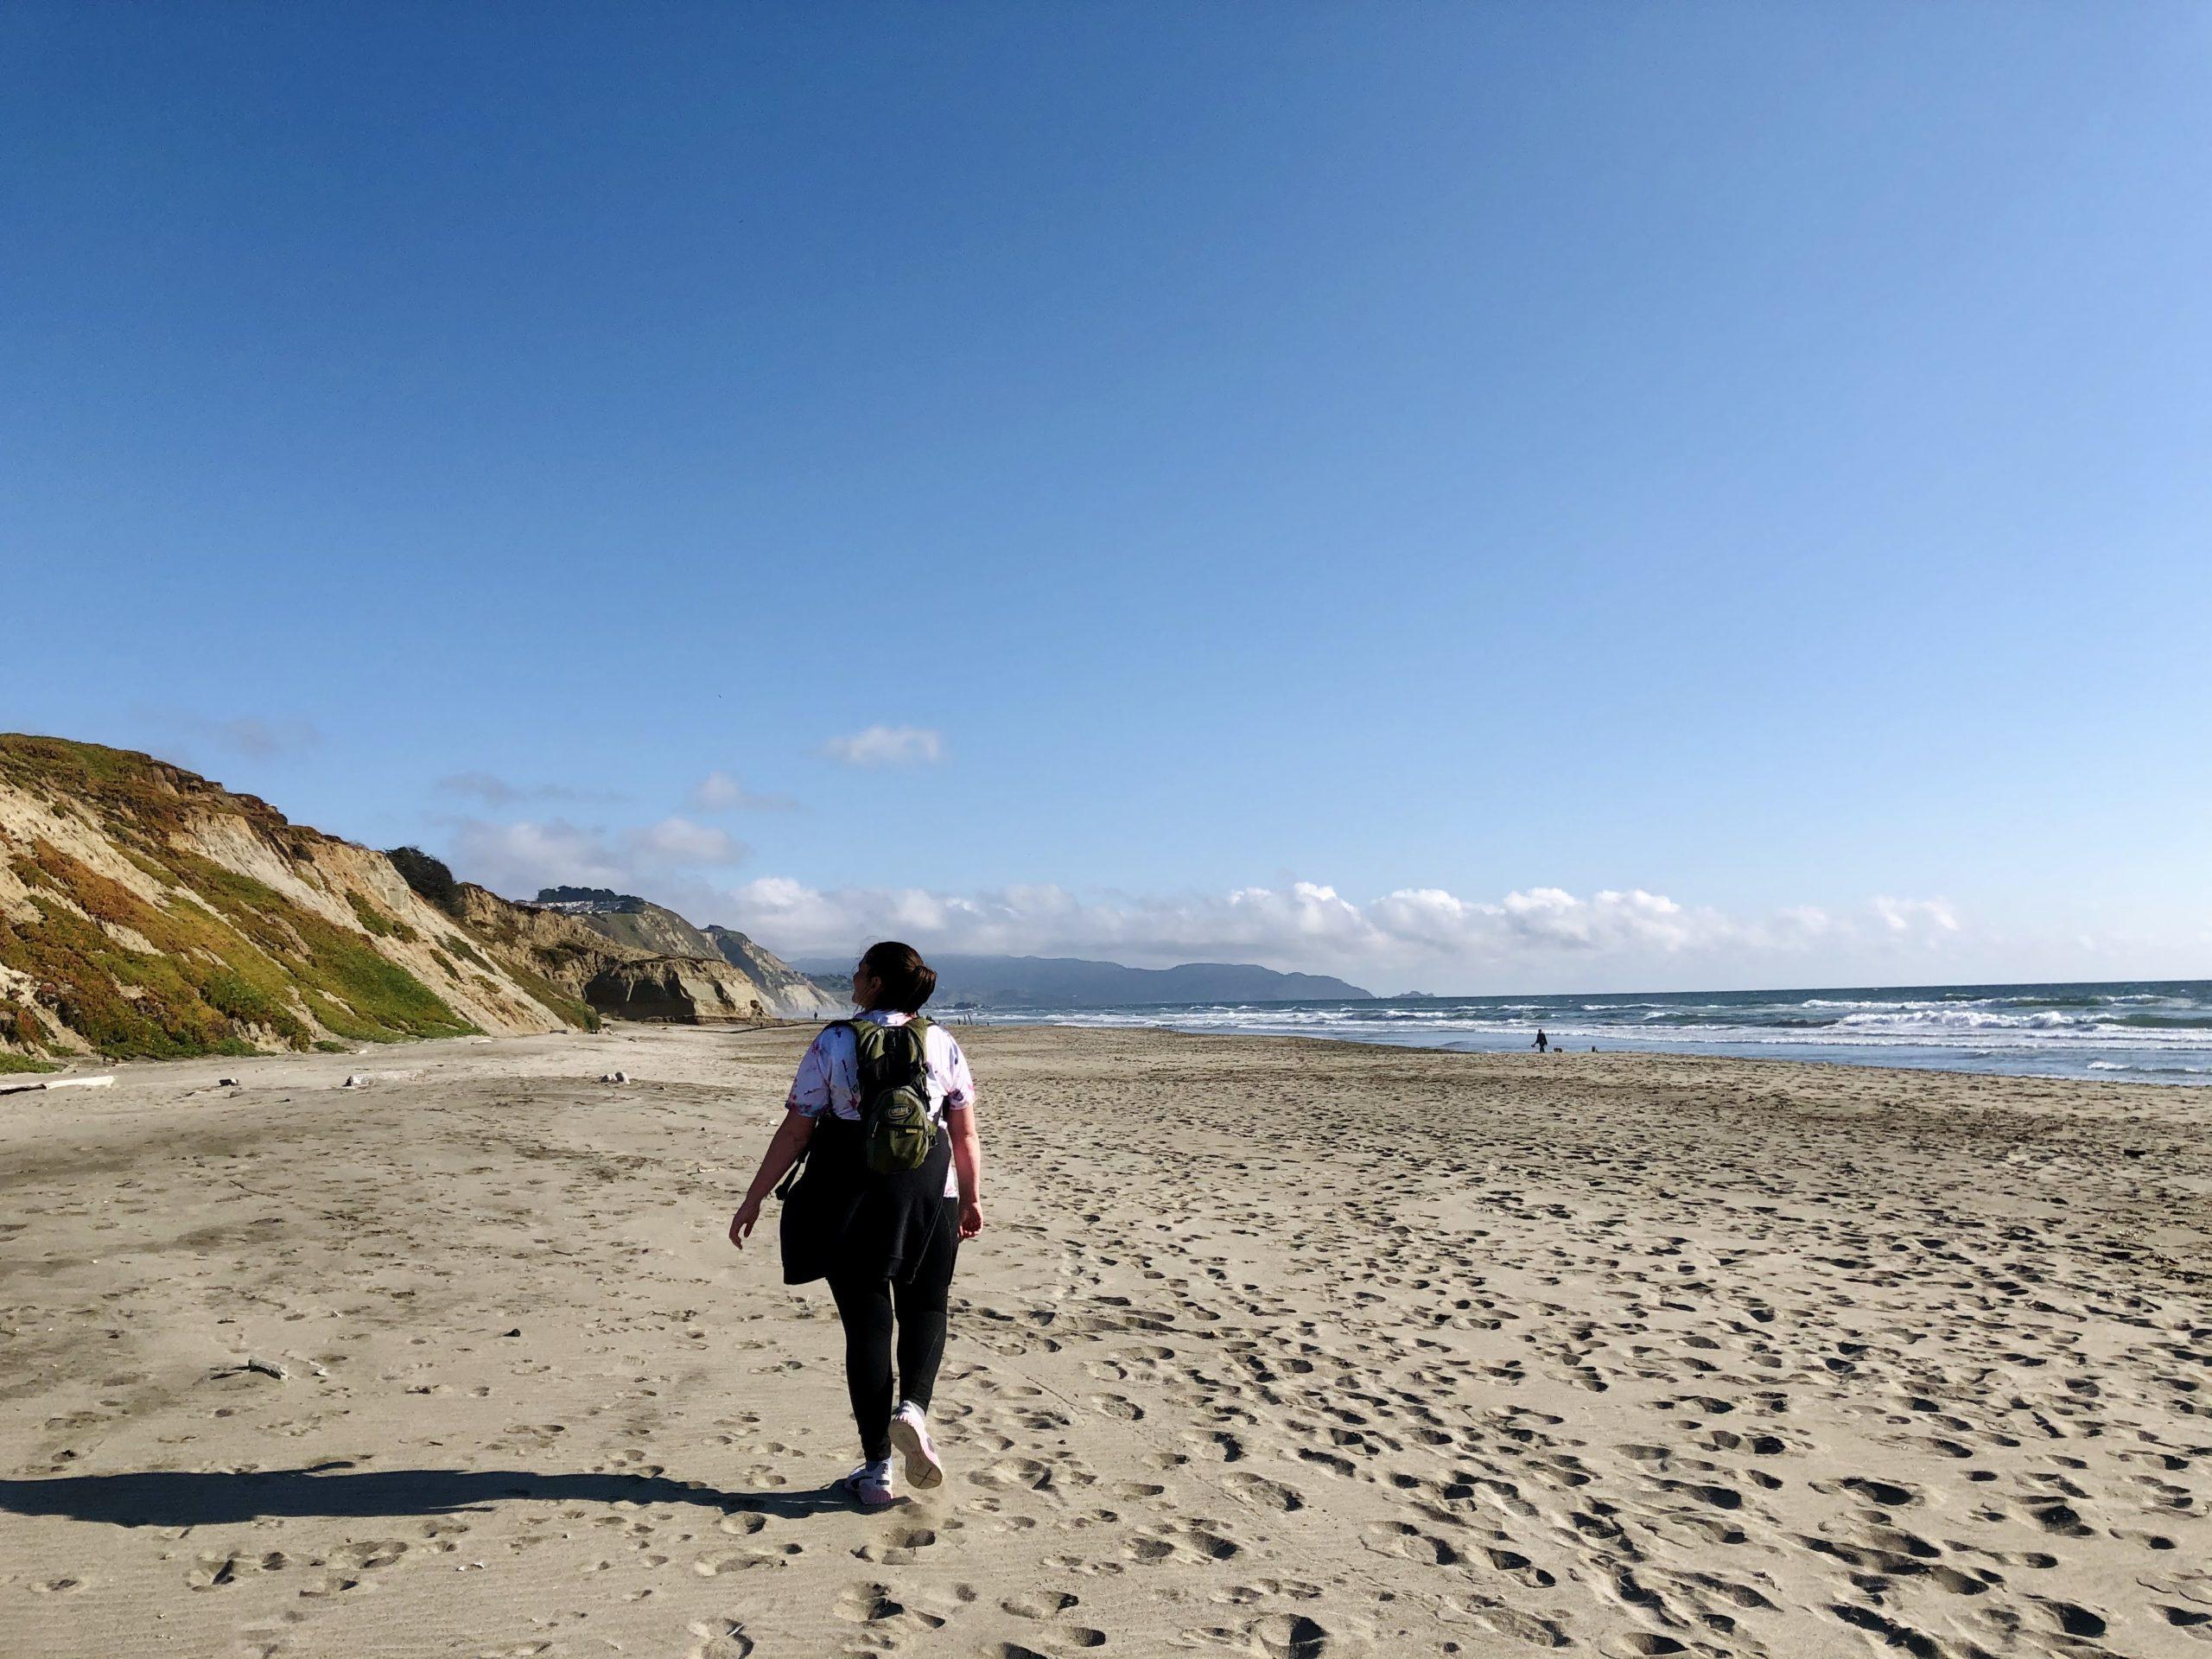 Social distancing on the beach near San Francisco